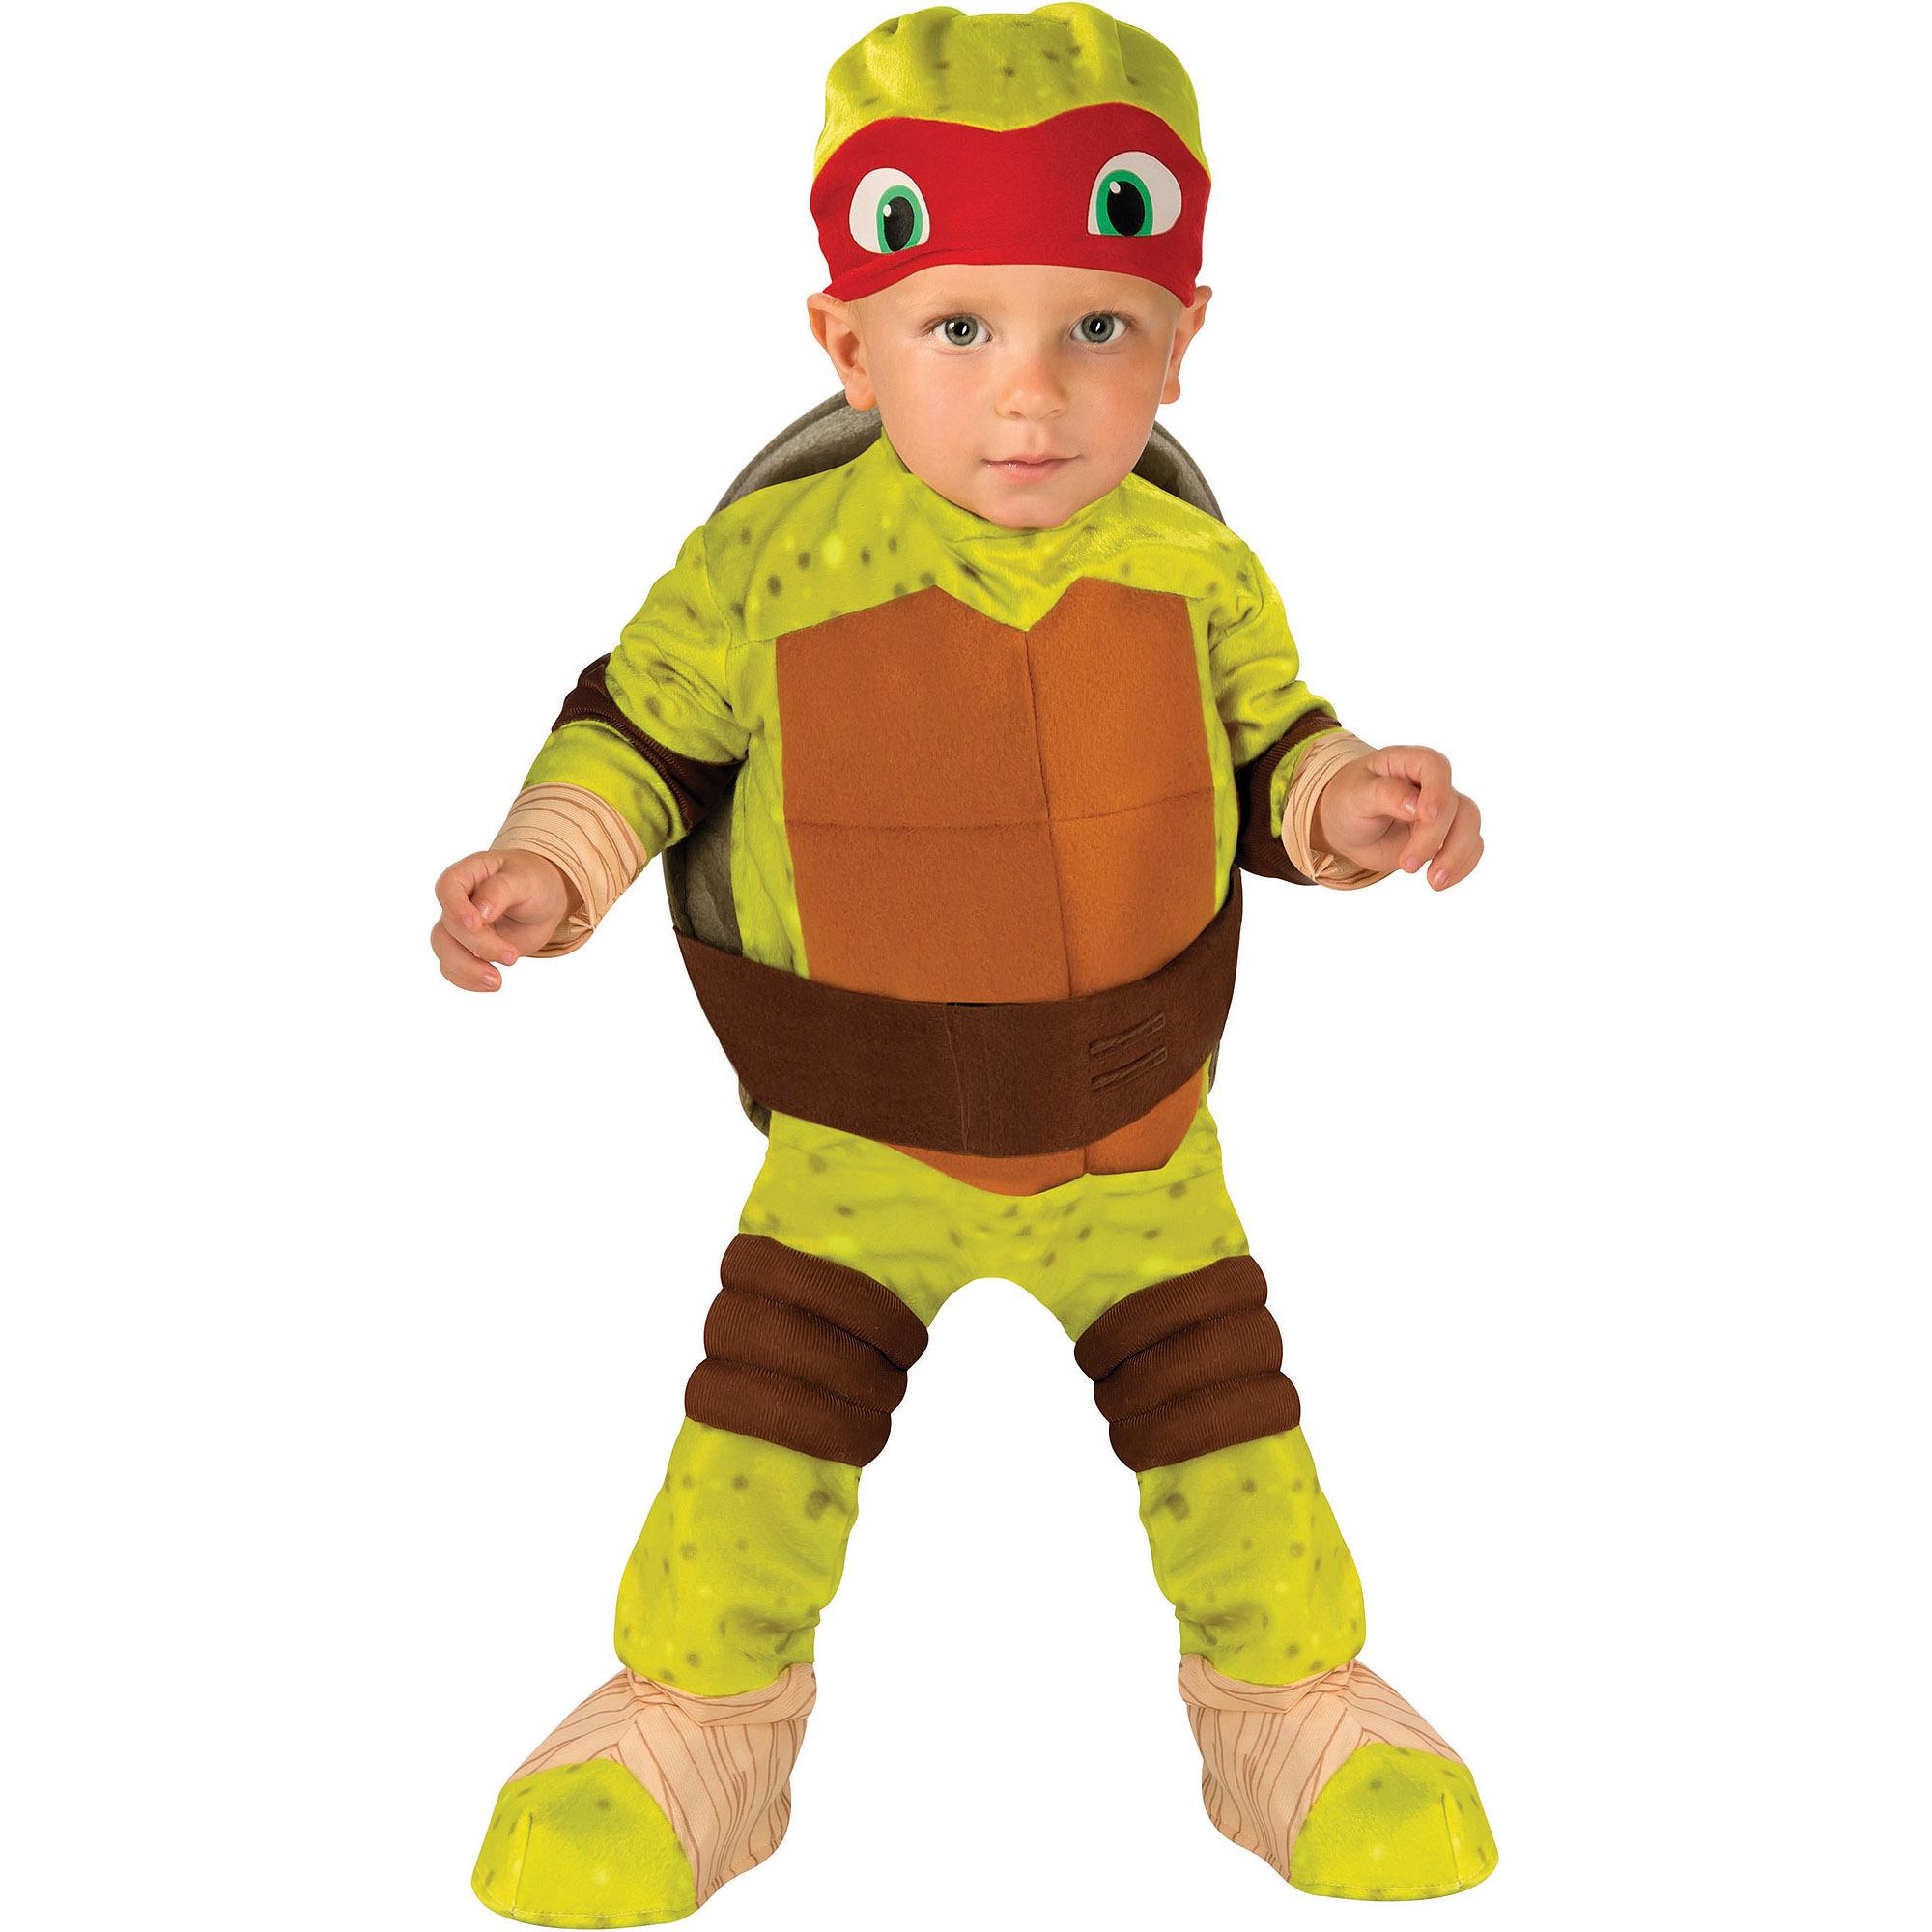 Teenage Mutant Ninja Turtle Raphael Toddler Boys Watermelon Wallpaper Rainbow Find Free HD for Desktop [freshlhys.tk]